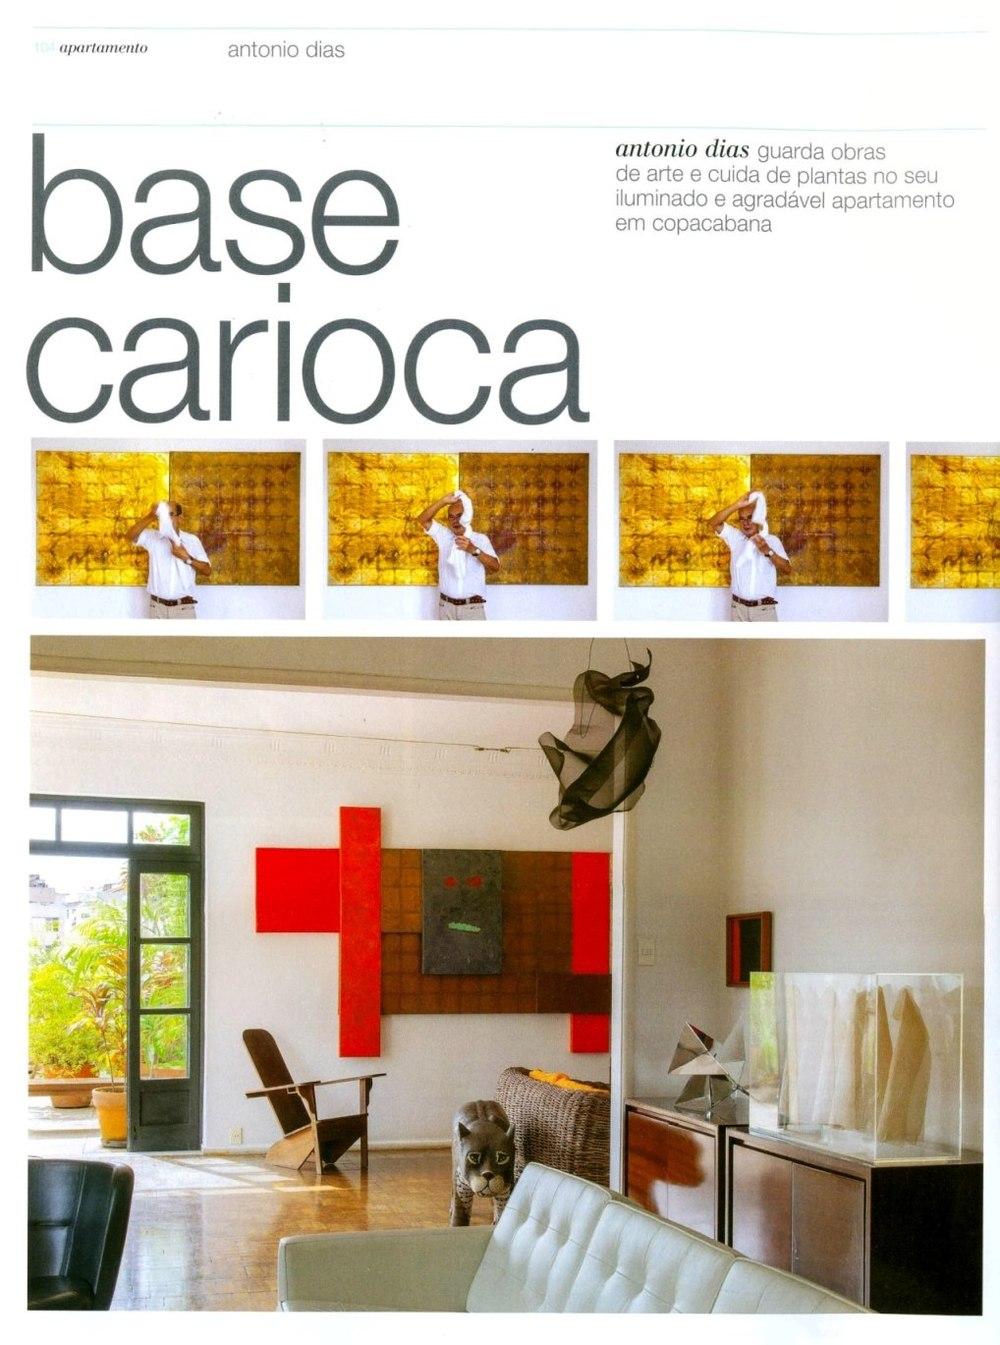 MÚL.TI.PLO ESPAÇO ARTE NA BAMBOO - ABRIL 2013 (2).jpg